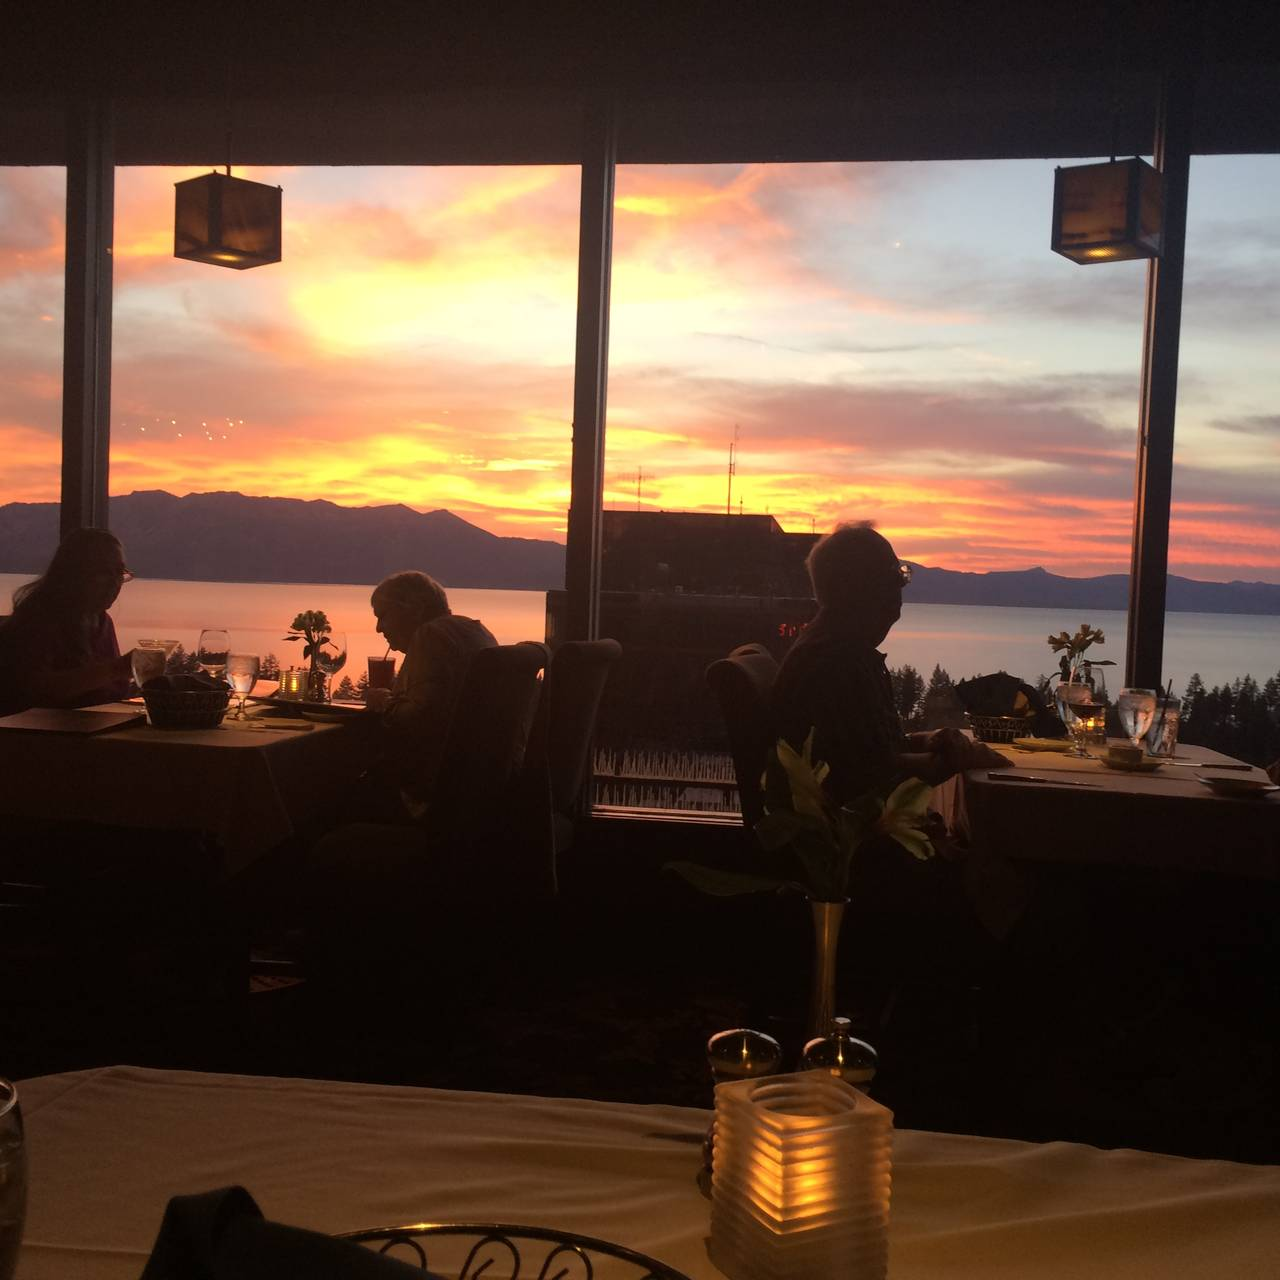 Friday S Station Steak Seafood Grill Harrah Lake Tahoe Restaurant Stateline Nv Opentable